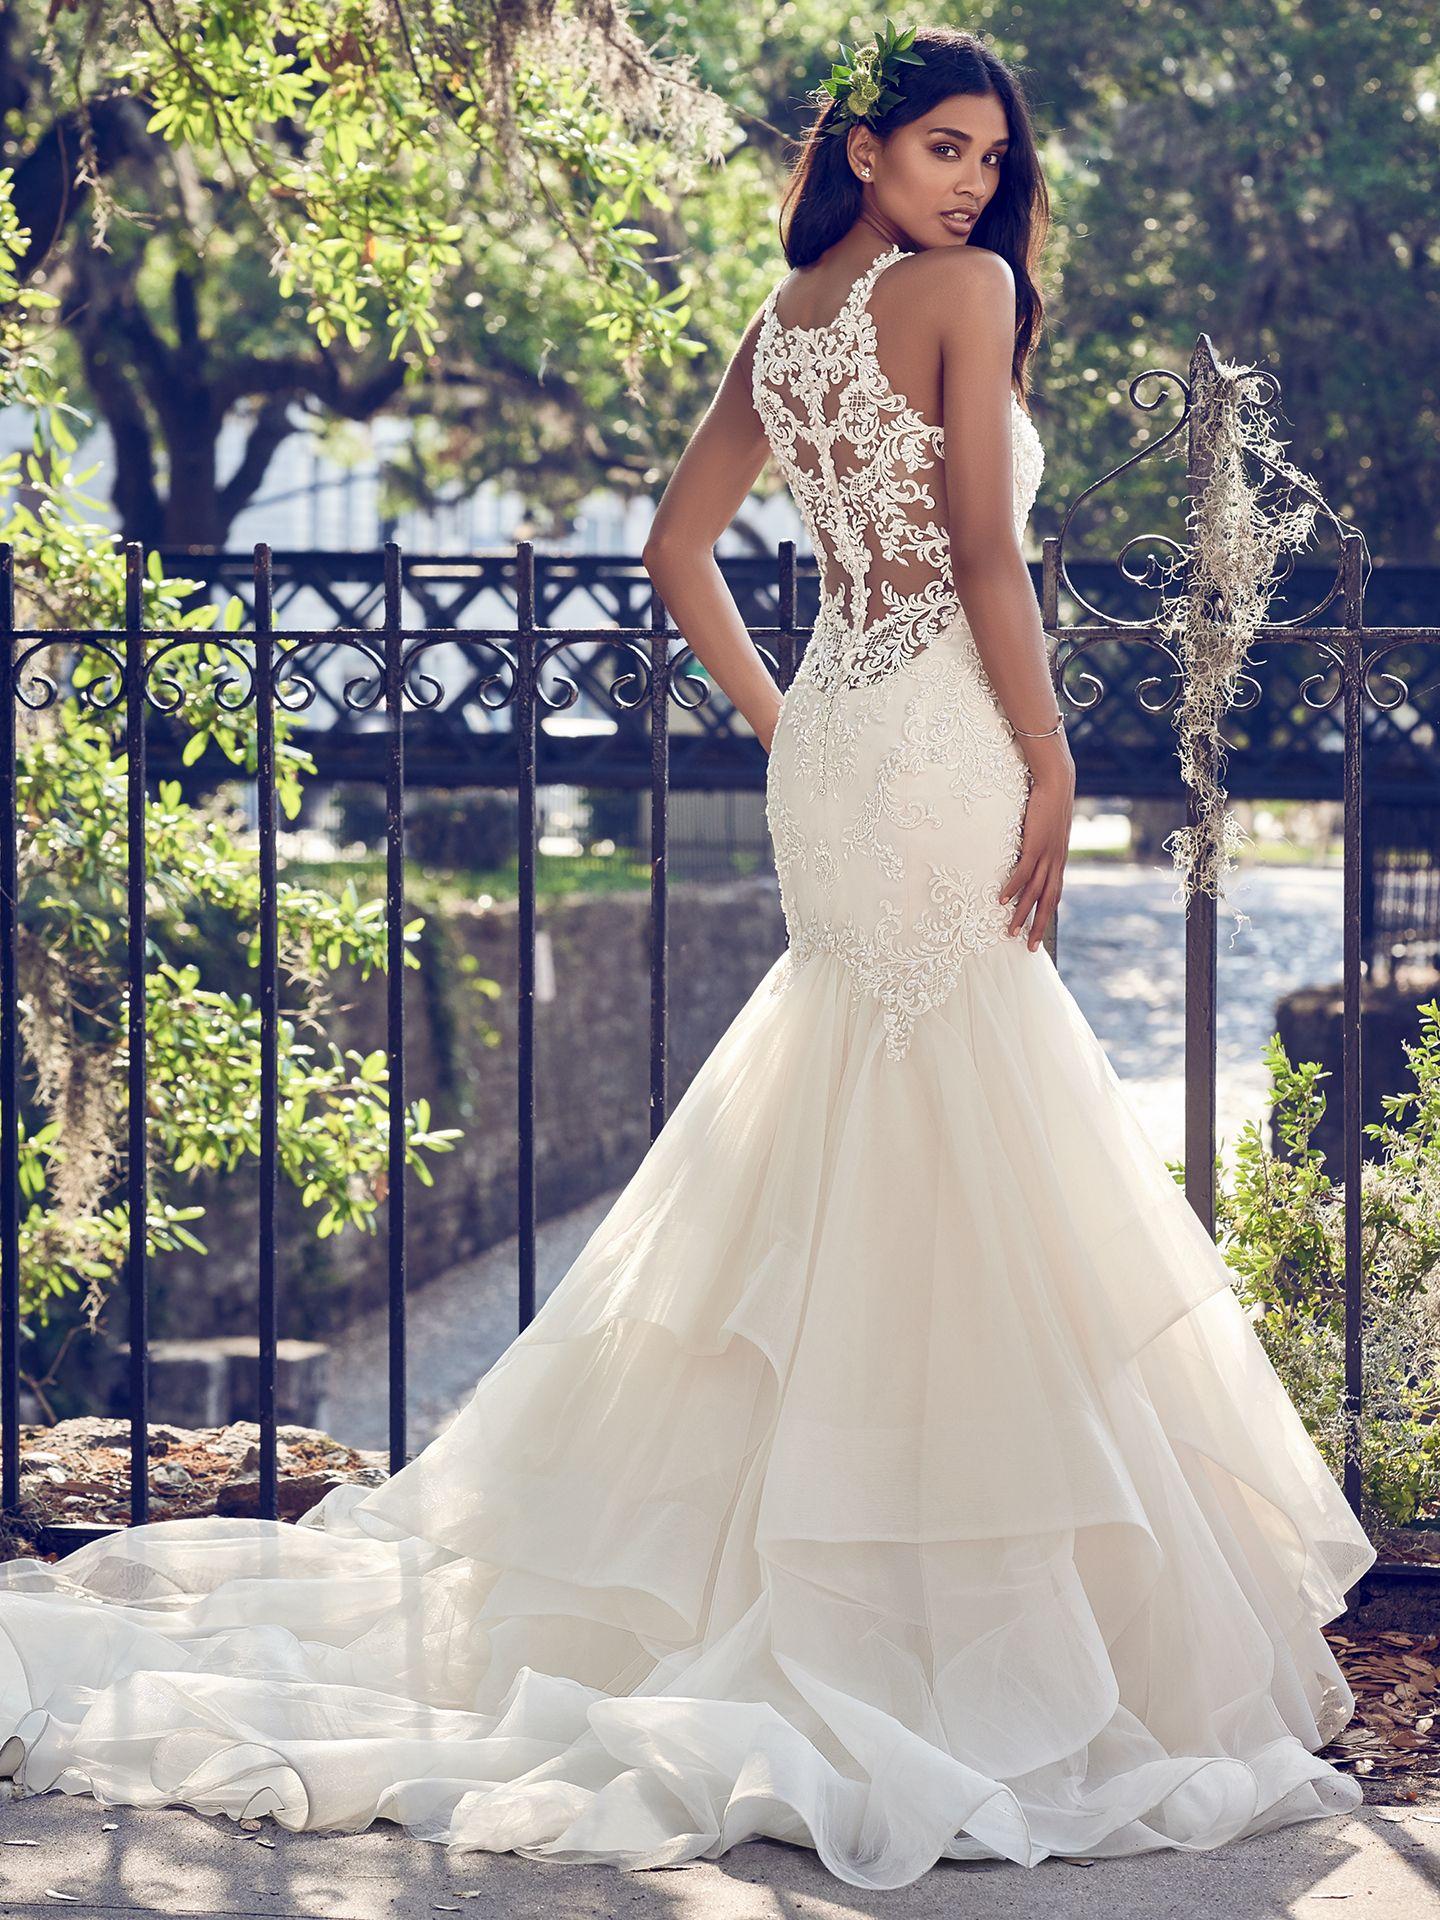 T-length lace wedding dresses november 2018 Maggie Sottero Wedding Dresses in   Someday uc  Pinterest